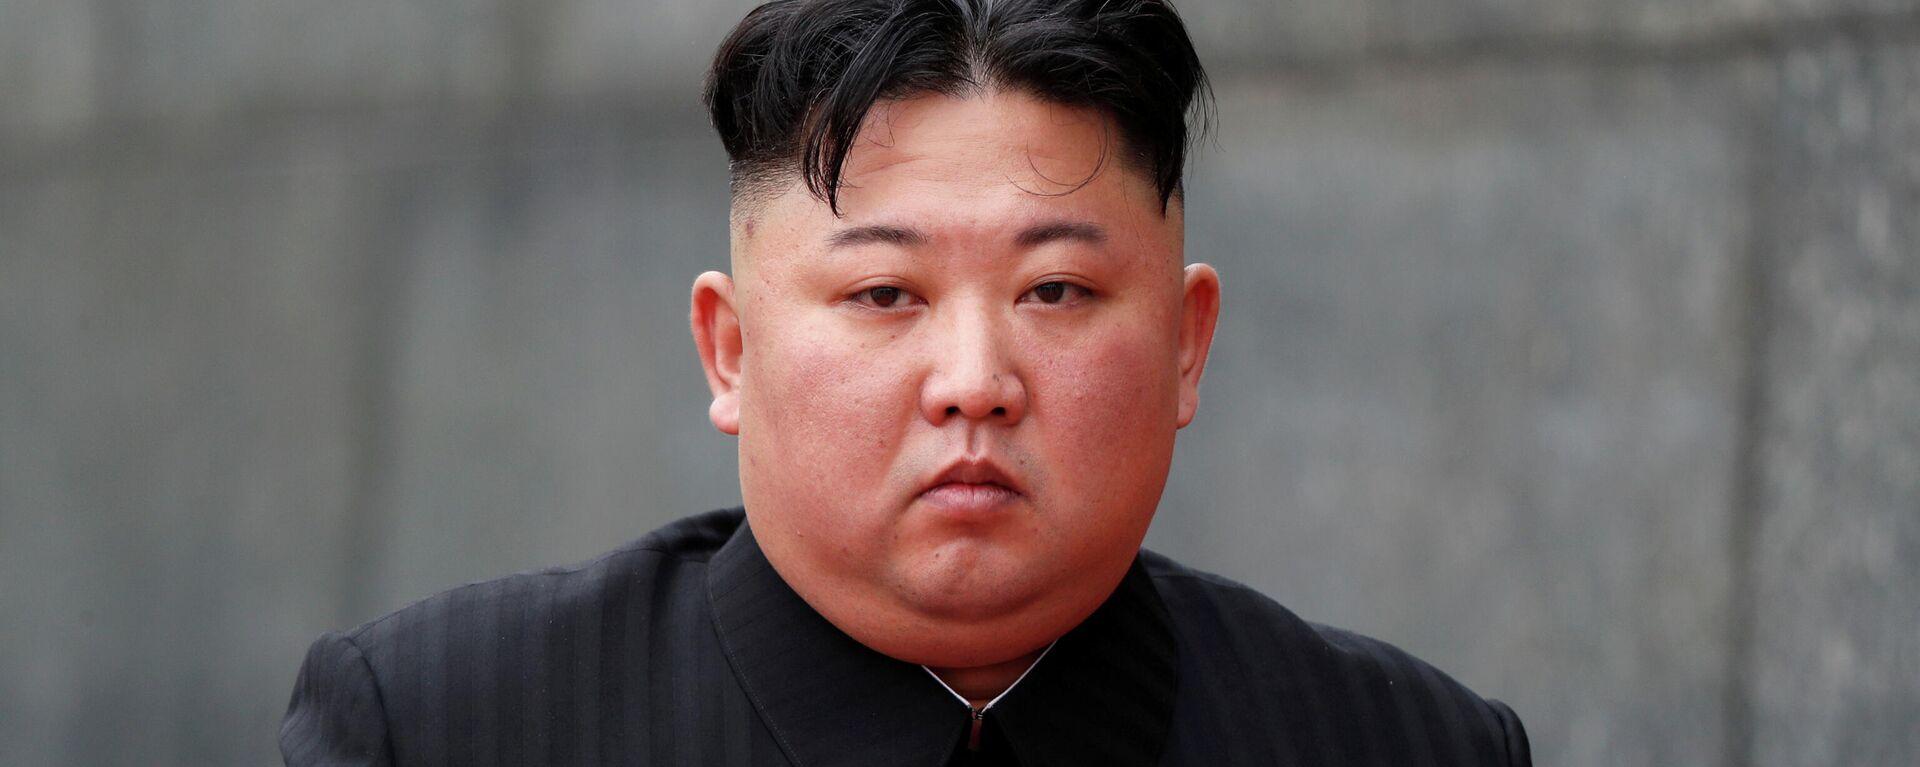 Kim Jong-un, líder de Corea del Norte (foto de archivo) - Sputnik Mundo, 1920, 07.04.2021